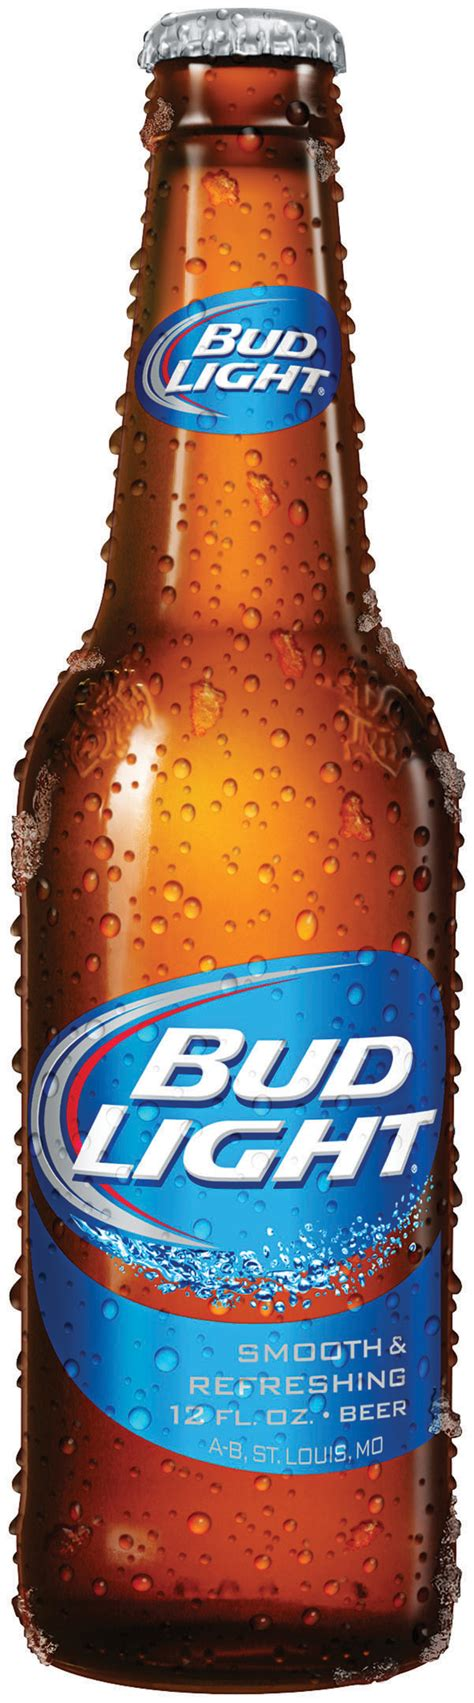 bud light beer bottle bud light end zone sporting lounge